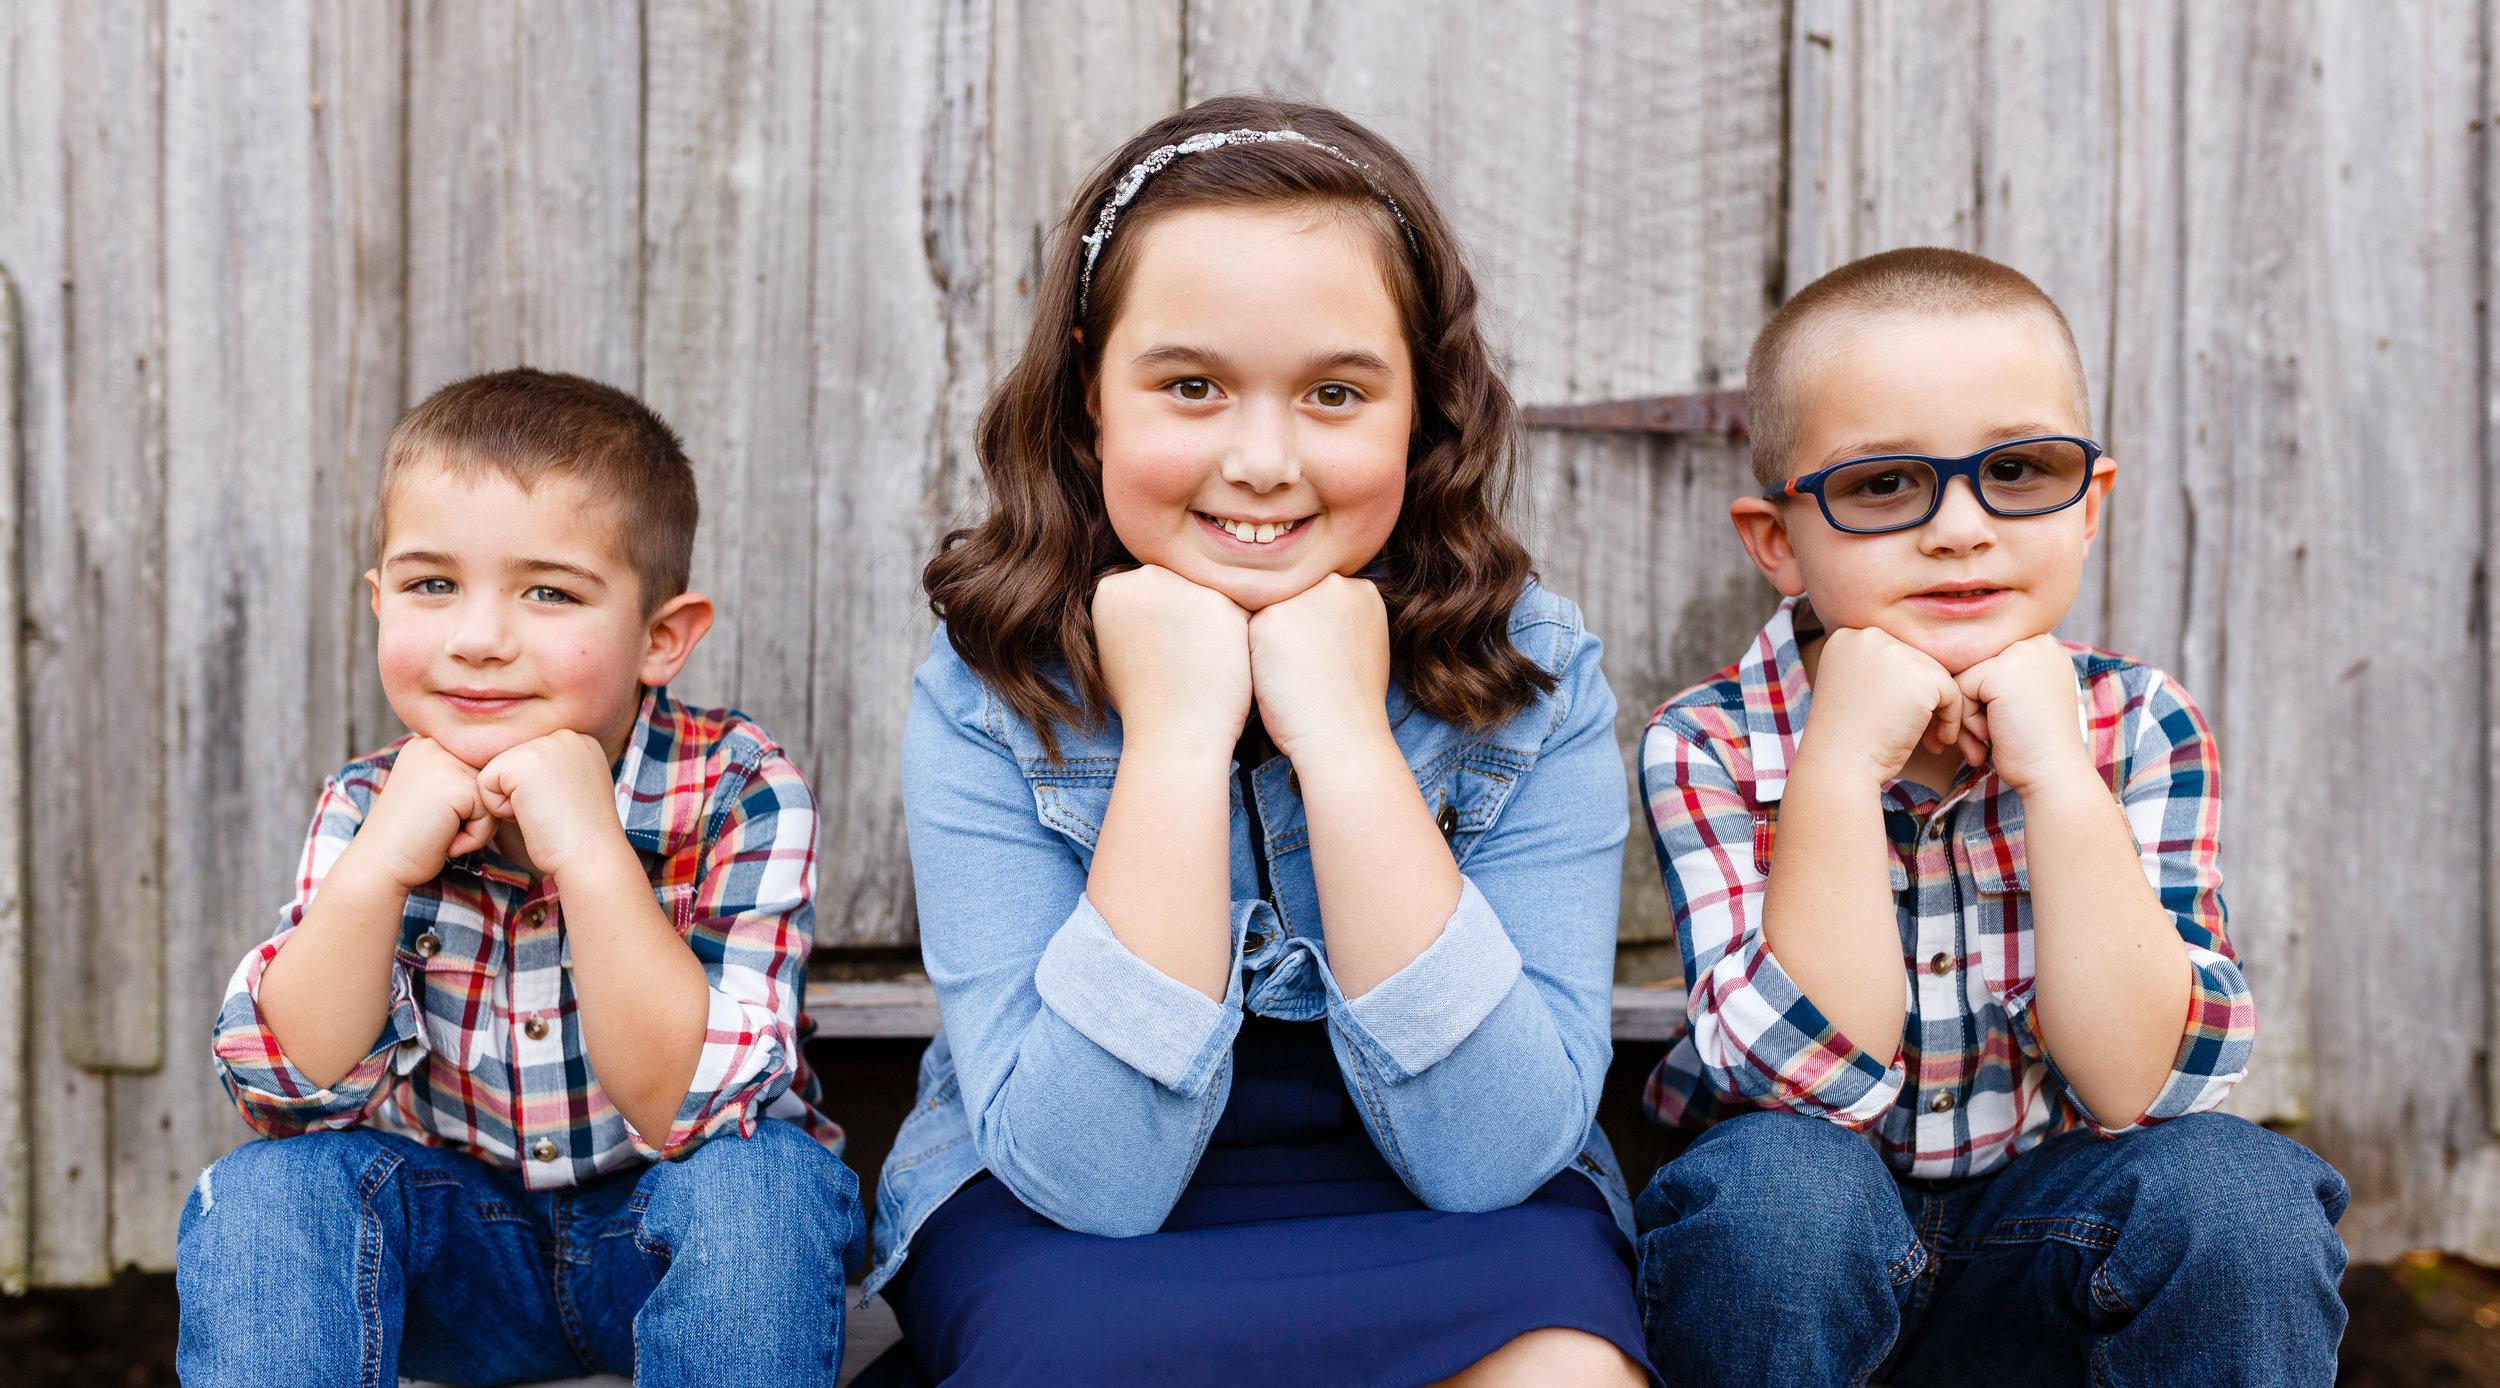 Family-child-portrait-lafayette-broussard-youngsville-photographer-2.jpg